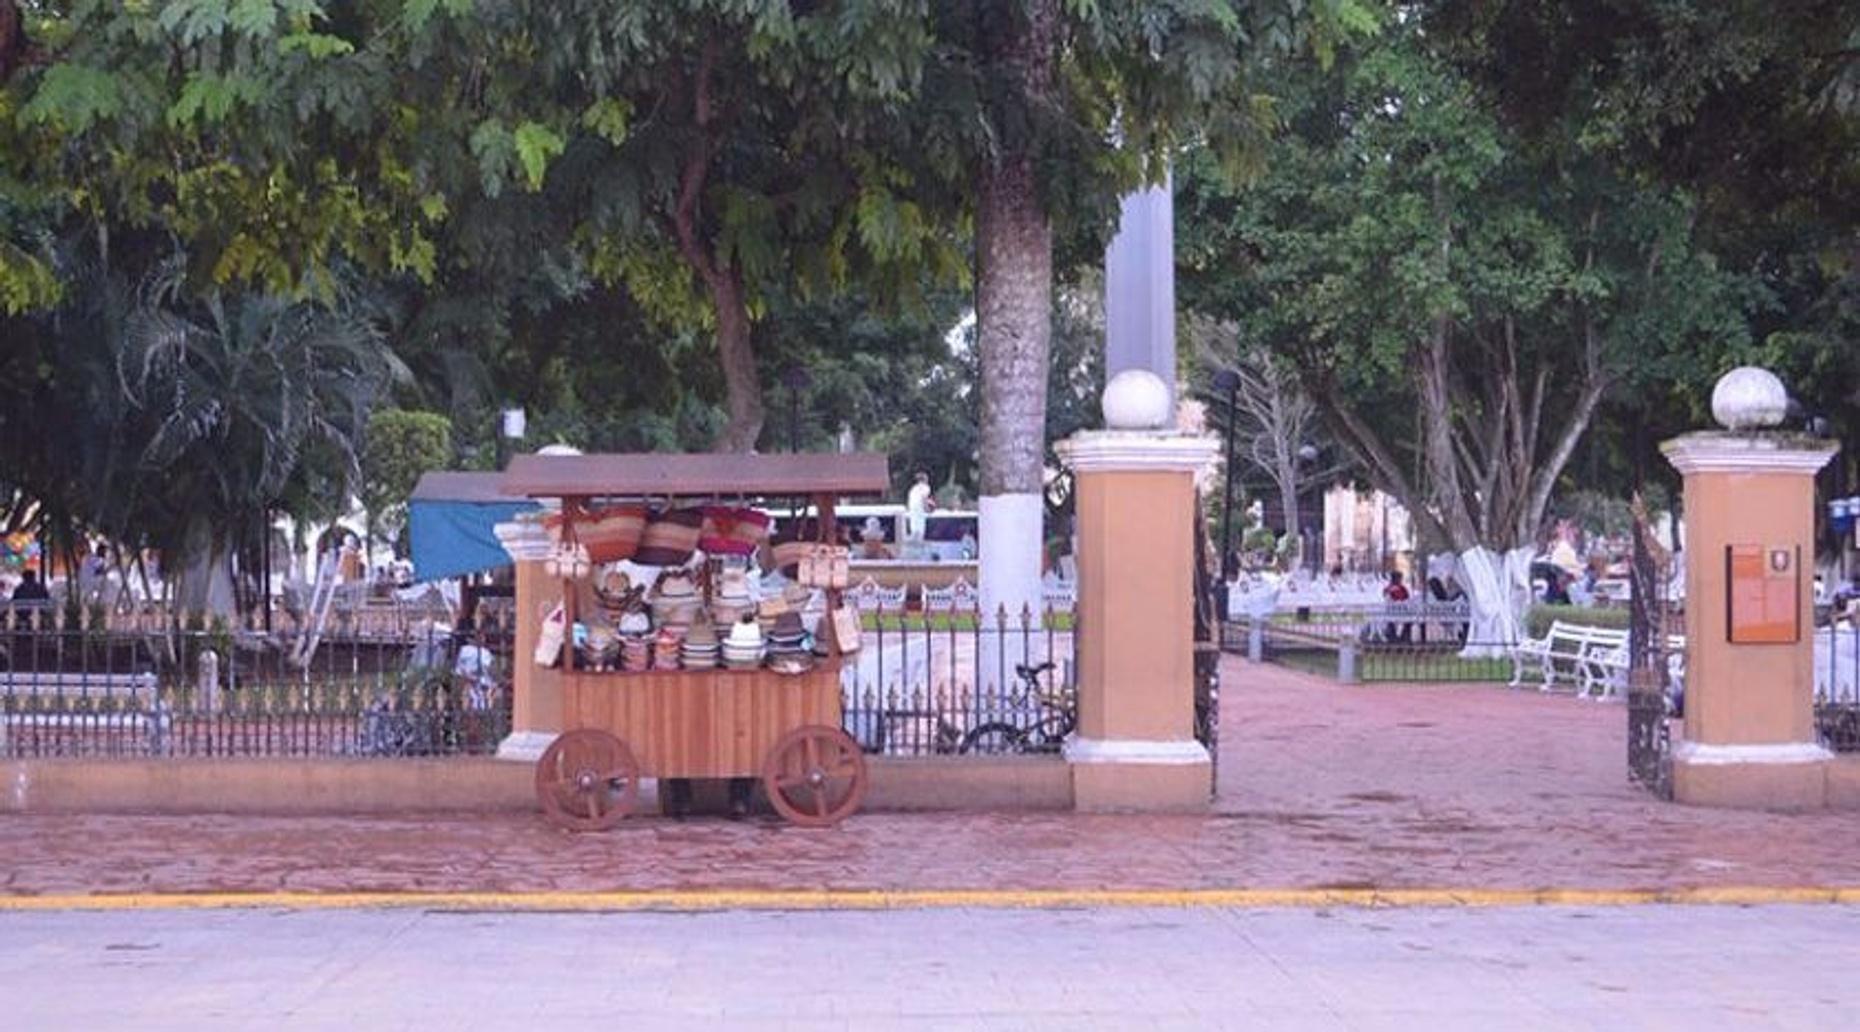 Chichen Itzá, Ik Kil & Valladolid Guided Tour in Cancun